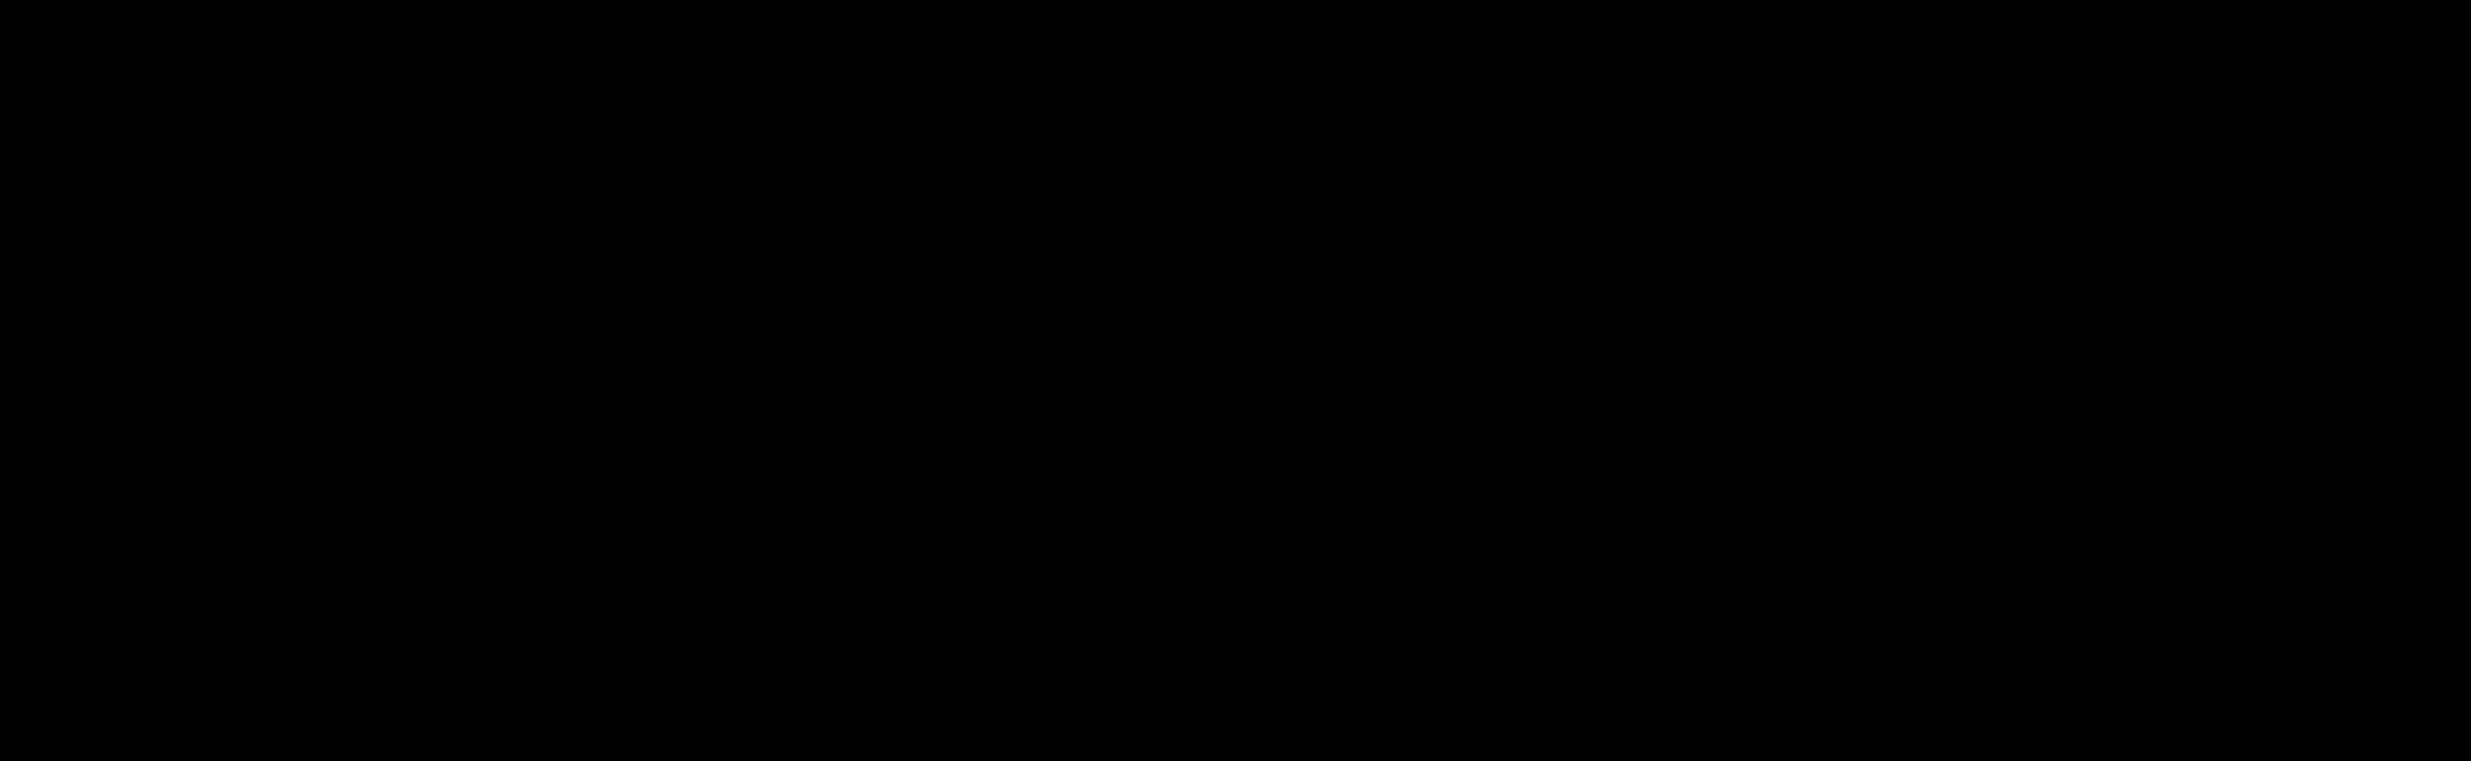 Atlas bank bovenaanzicht - Mulleman Meubelen